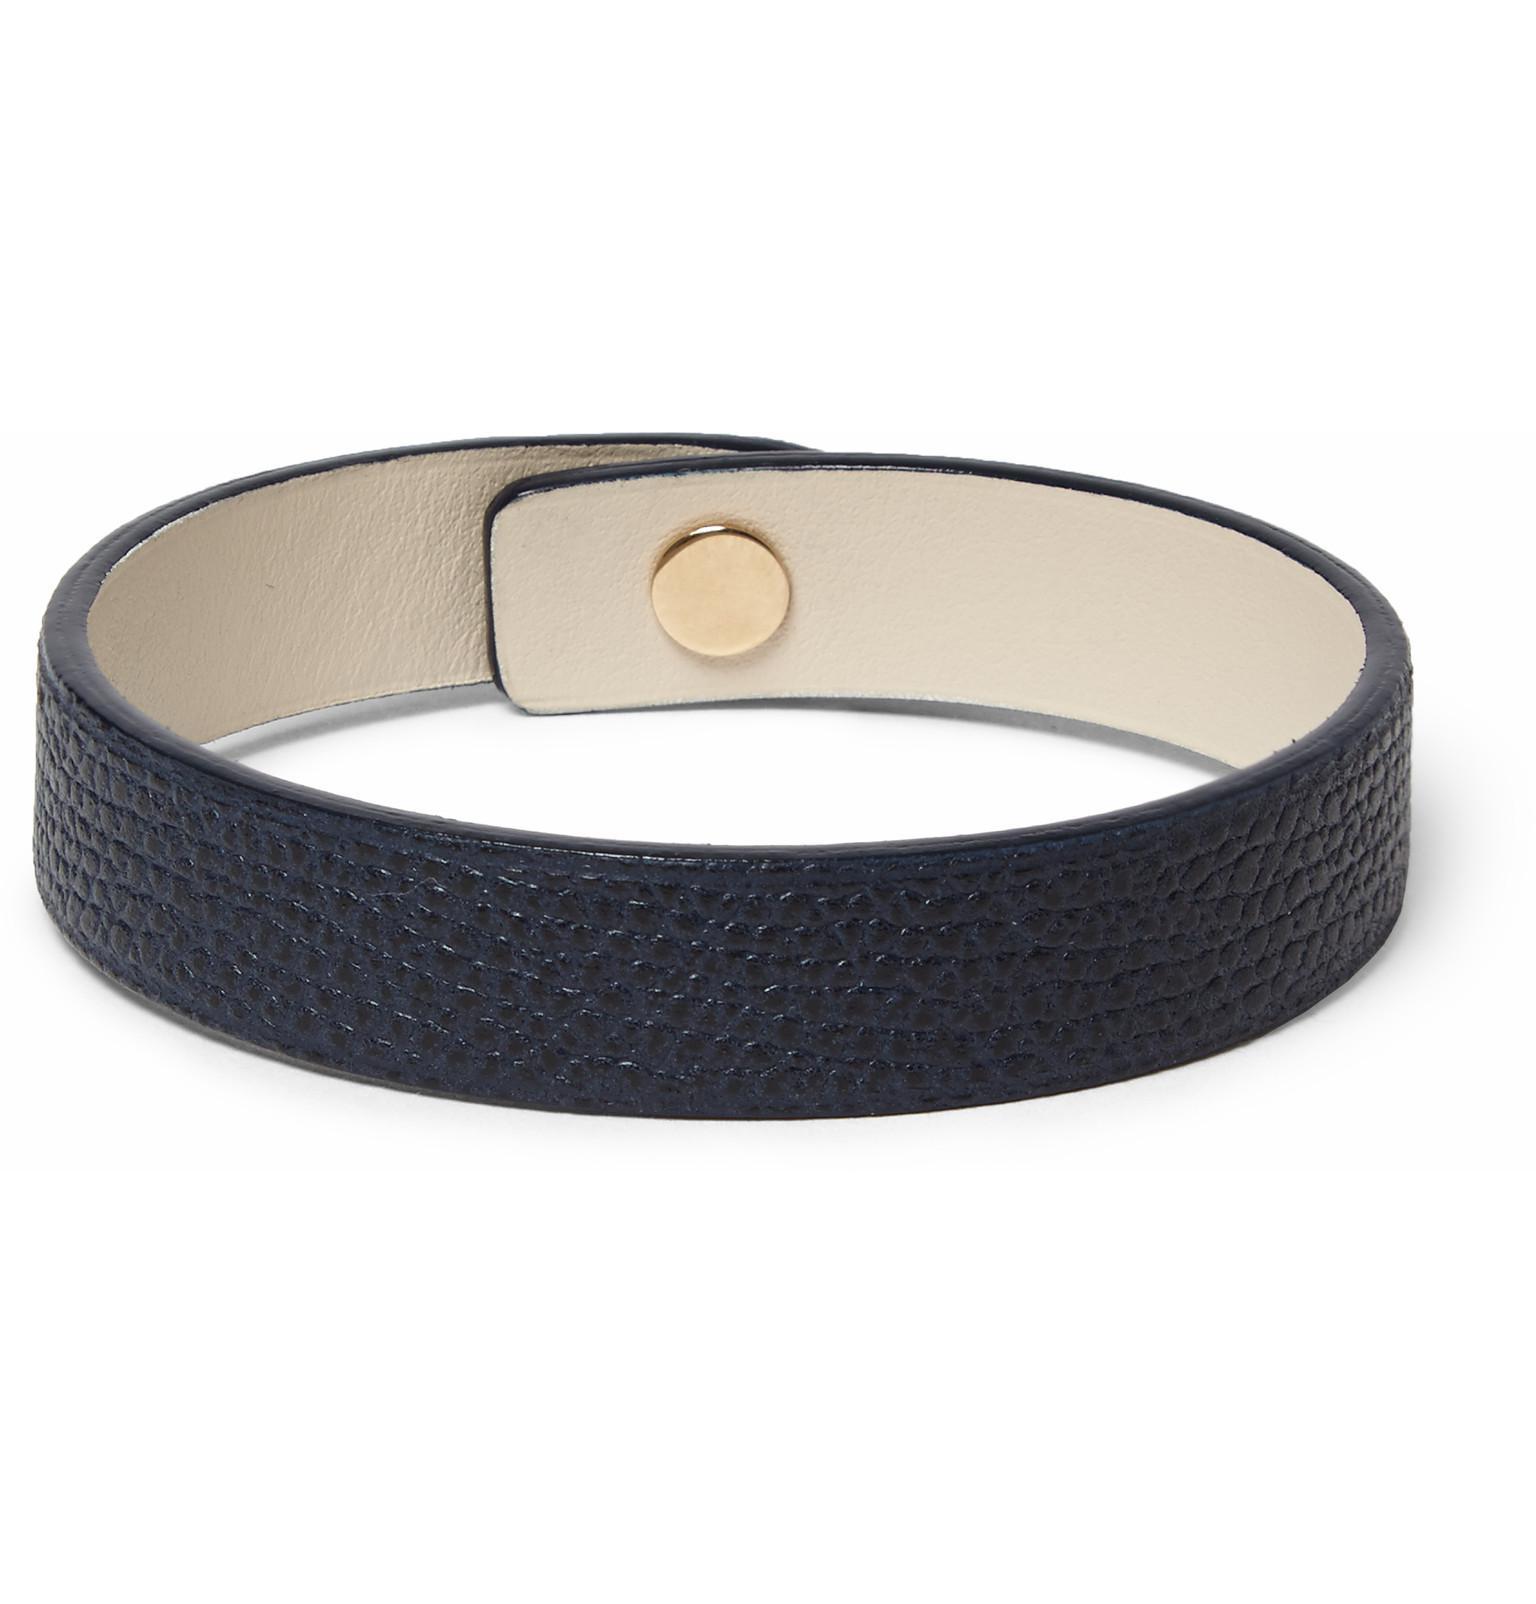 Valextra Pebble-grain Leather Wrap Bracelet - Navy rG5q8R